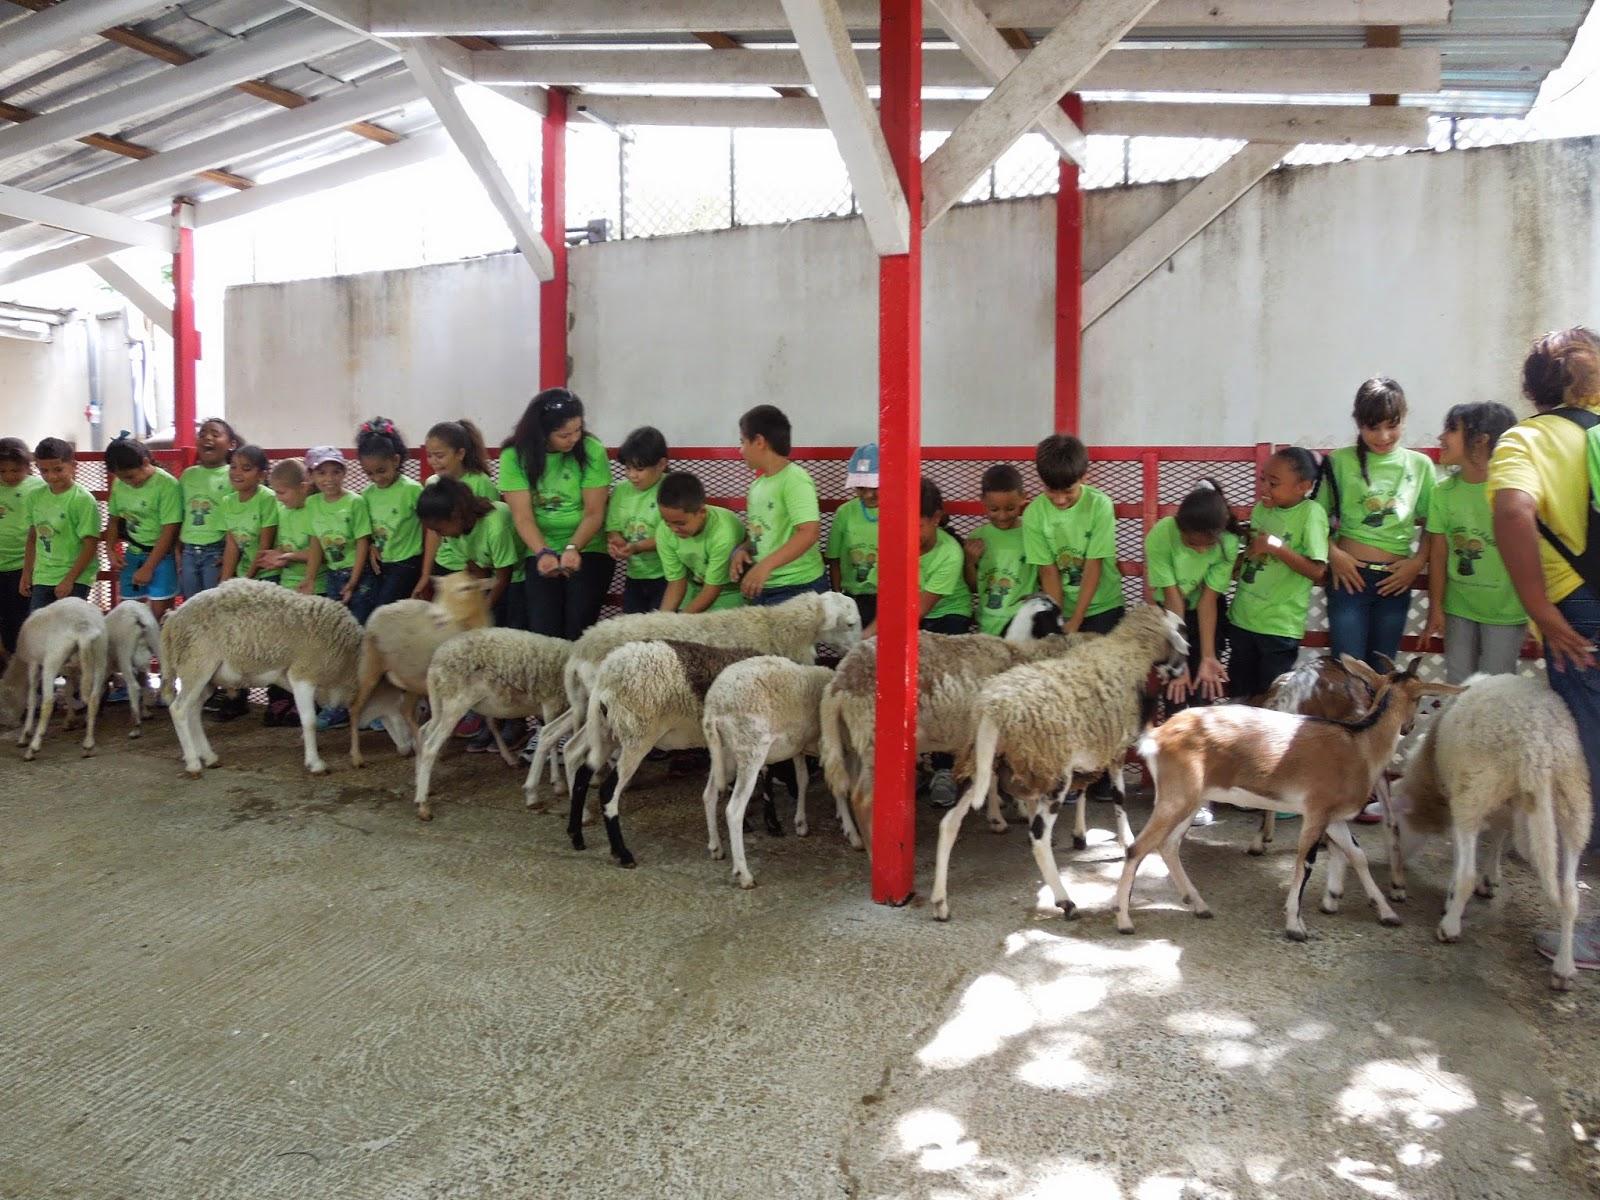 The learning spot villa campestre guaynabo for Campamento de verano jardin botanico caguas